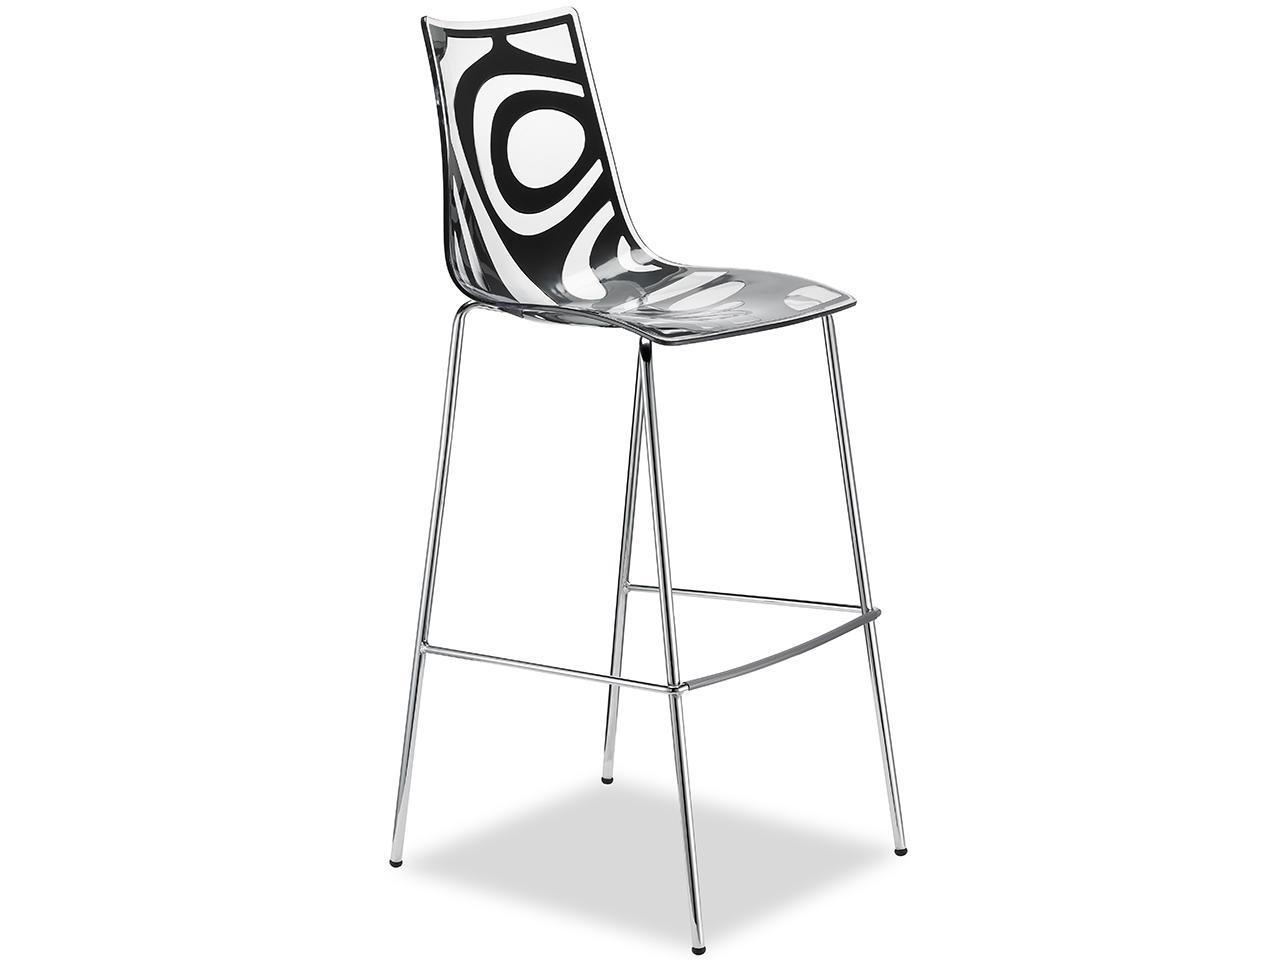 Барный пластиковый стул Wave Barstool